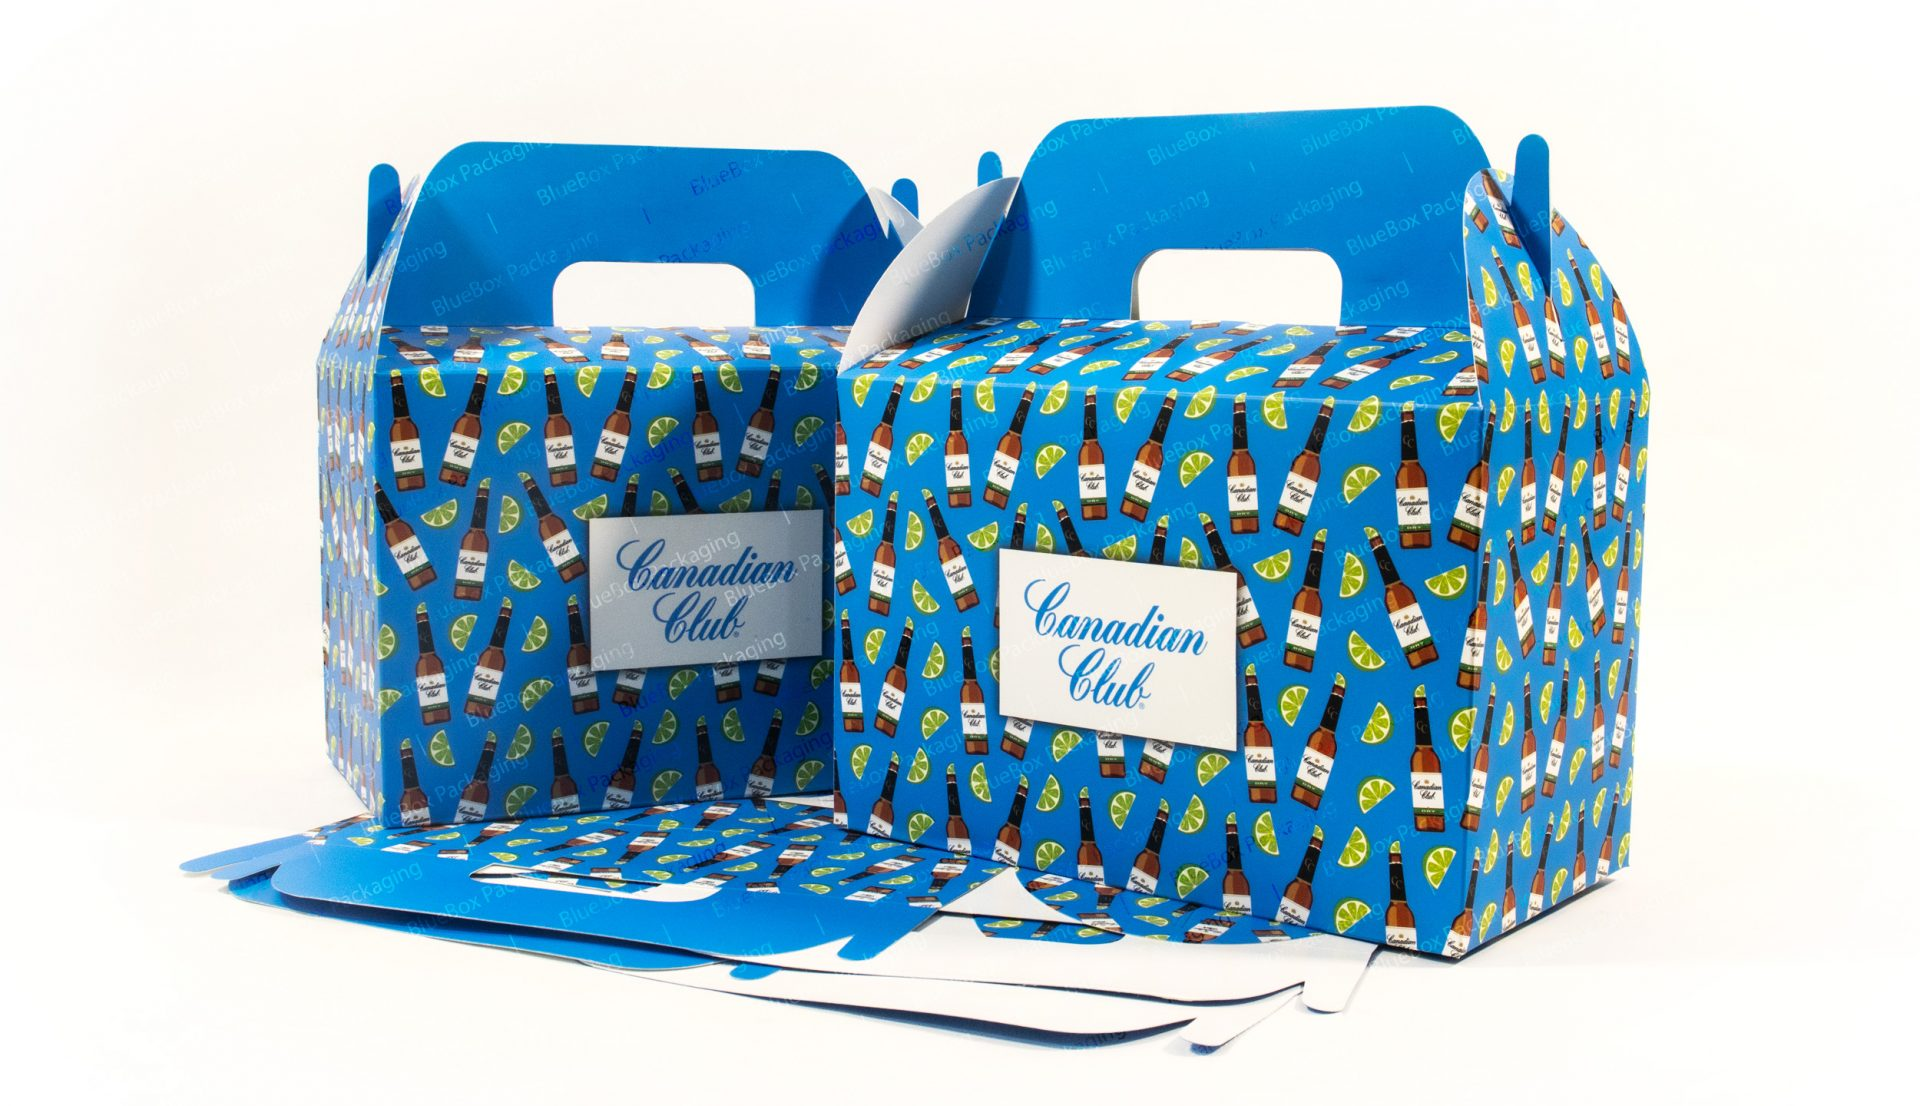 cardboard gable boxes